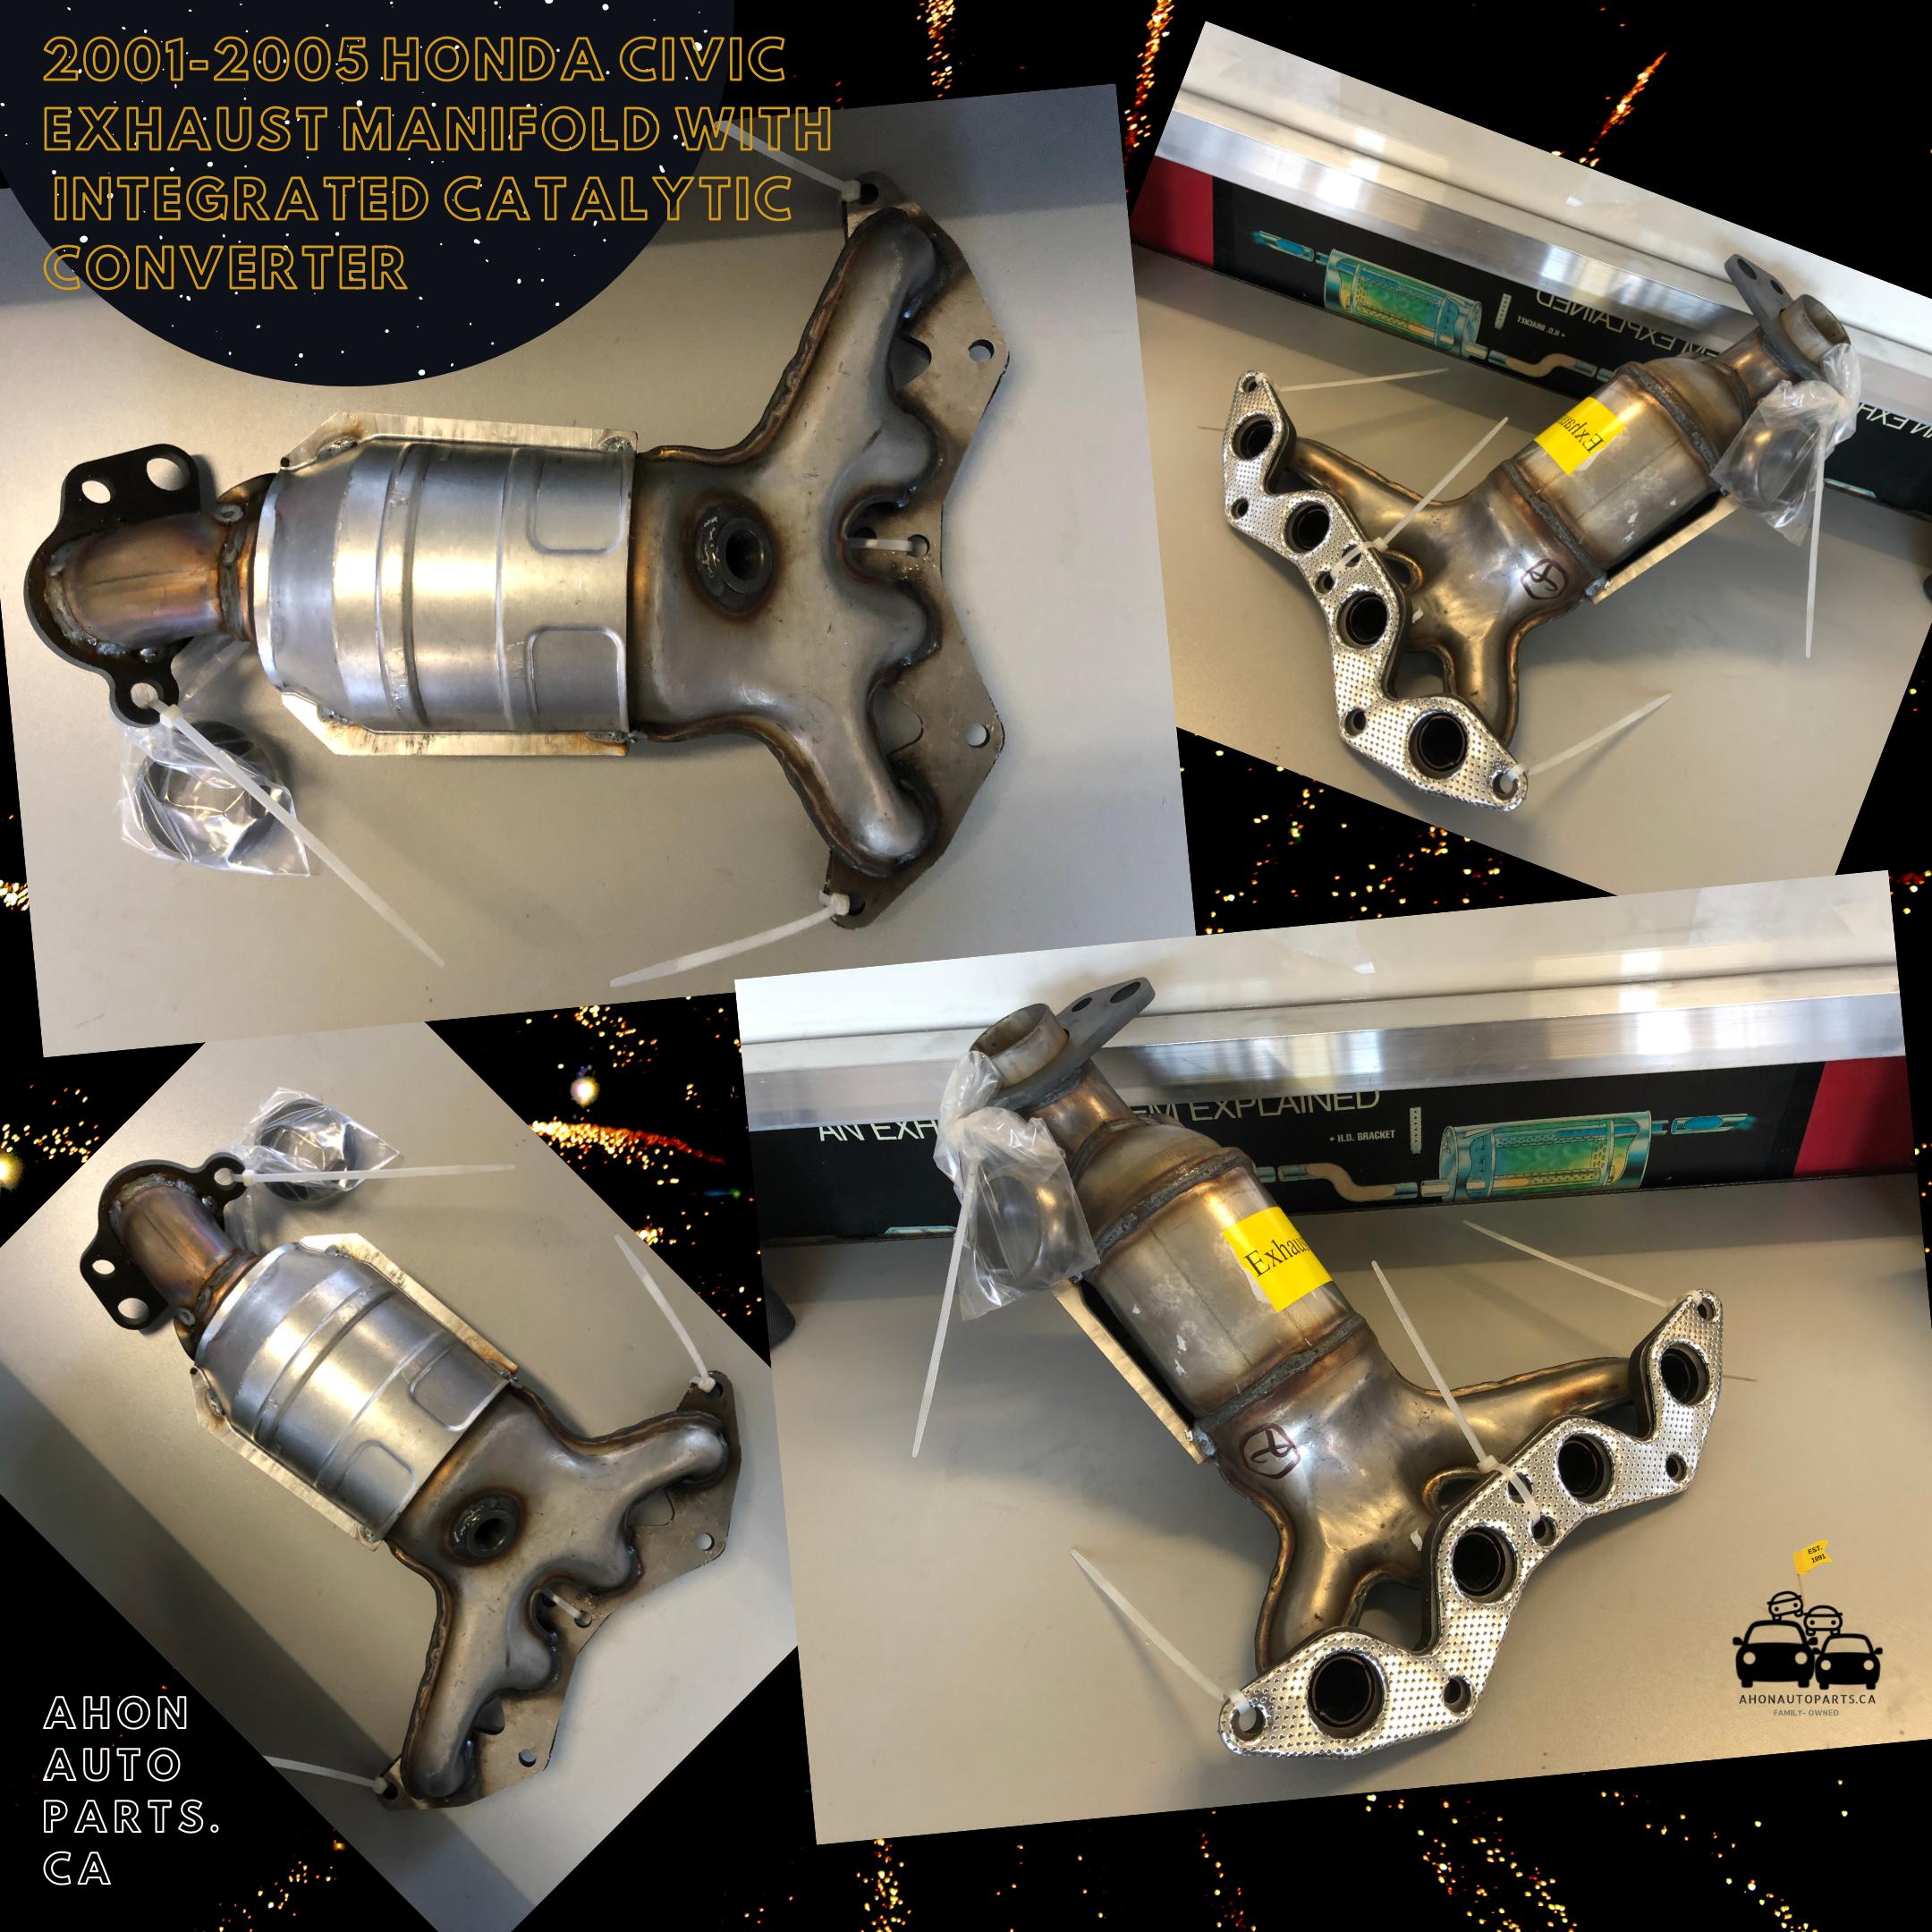 2001 2005 honda civic exhaust manifold